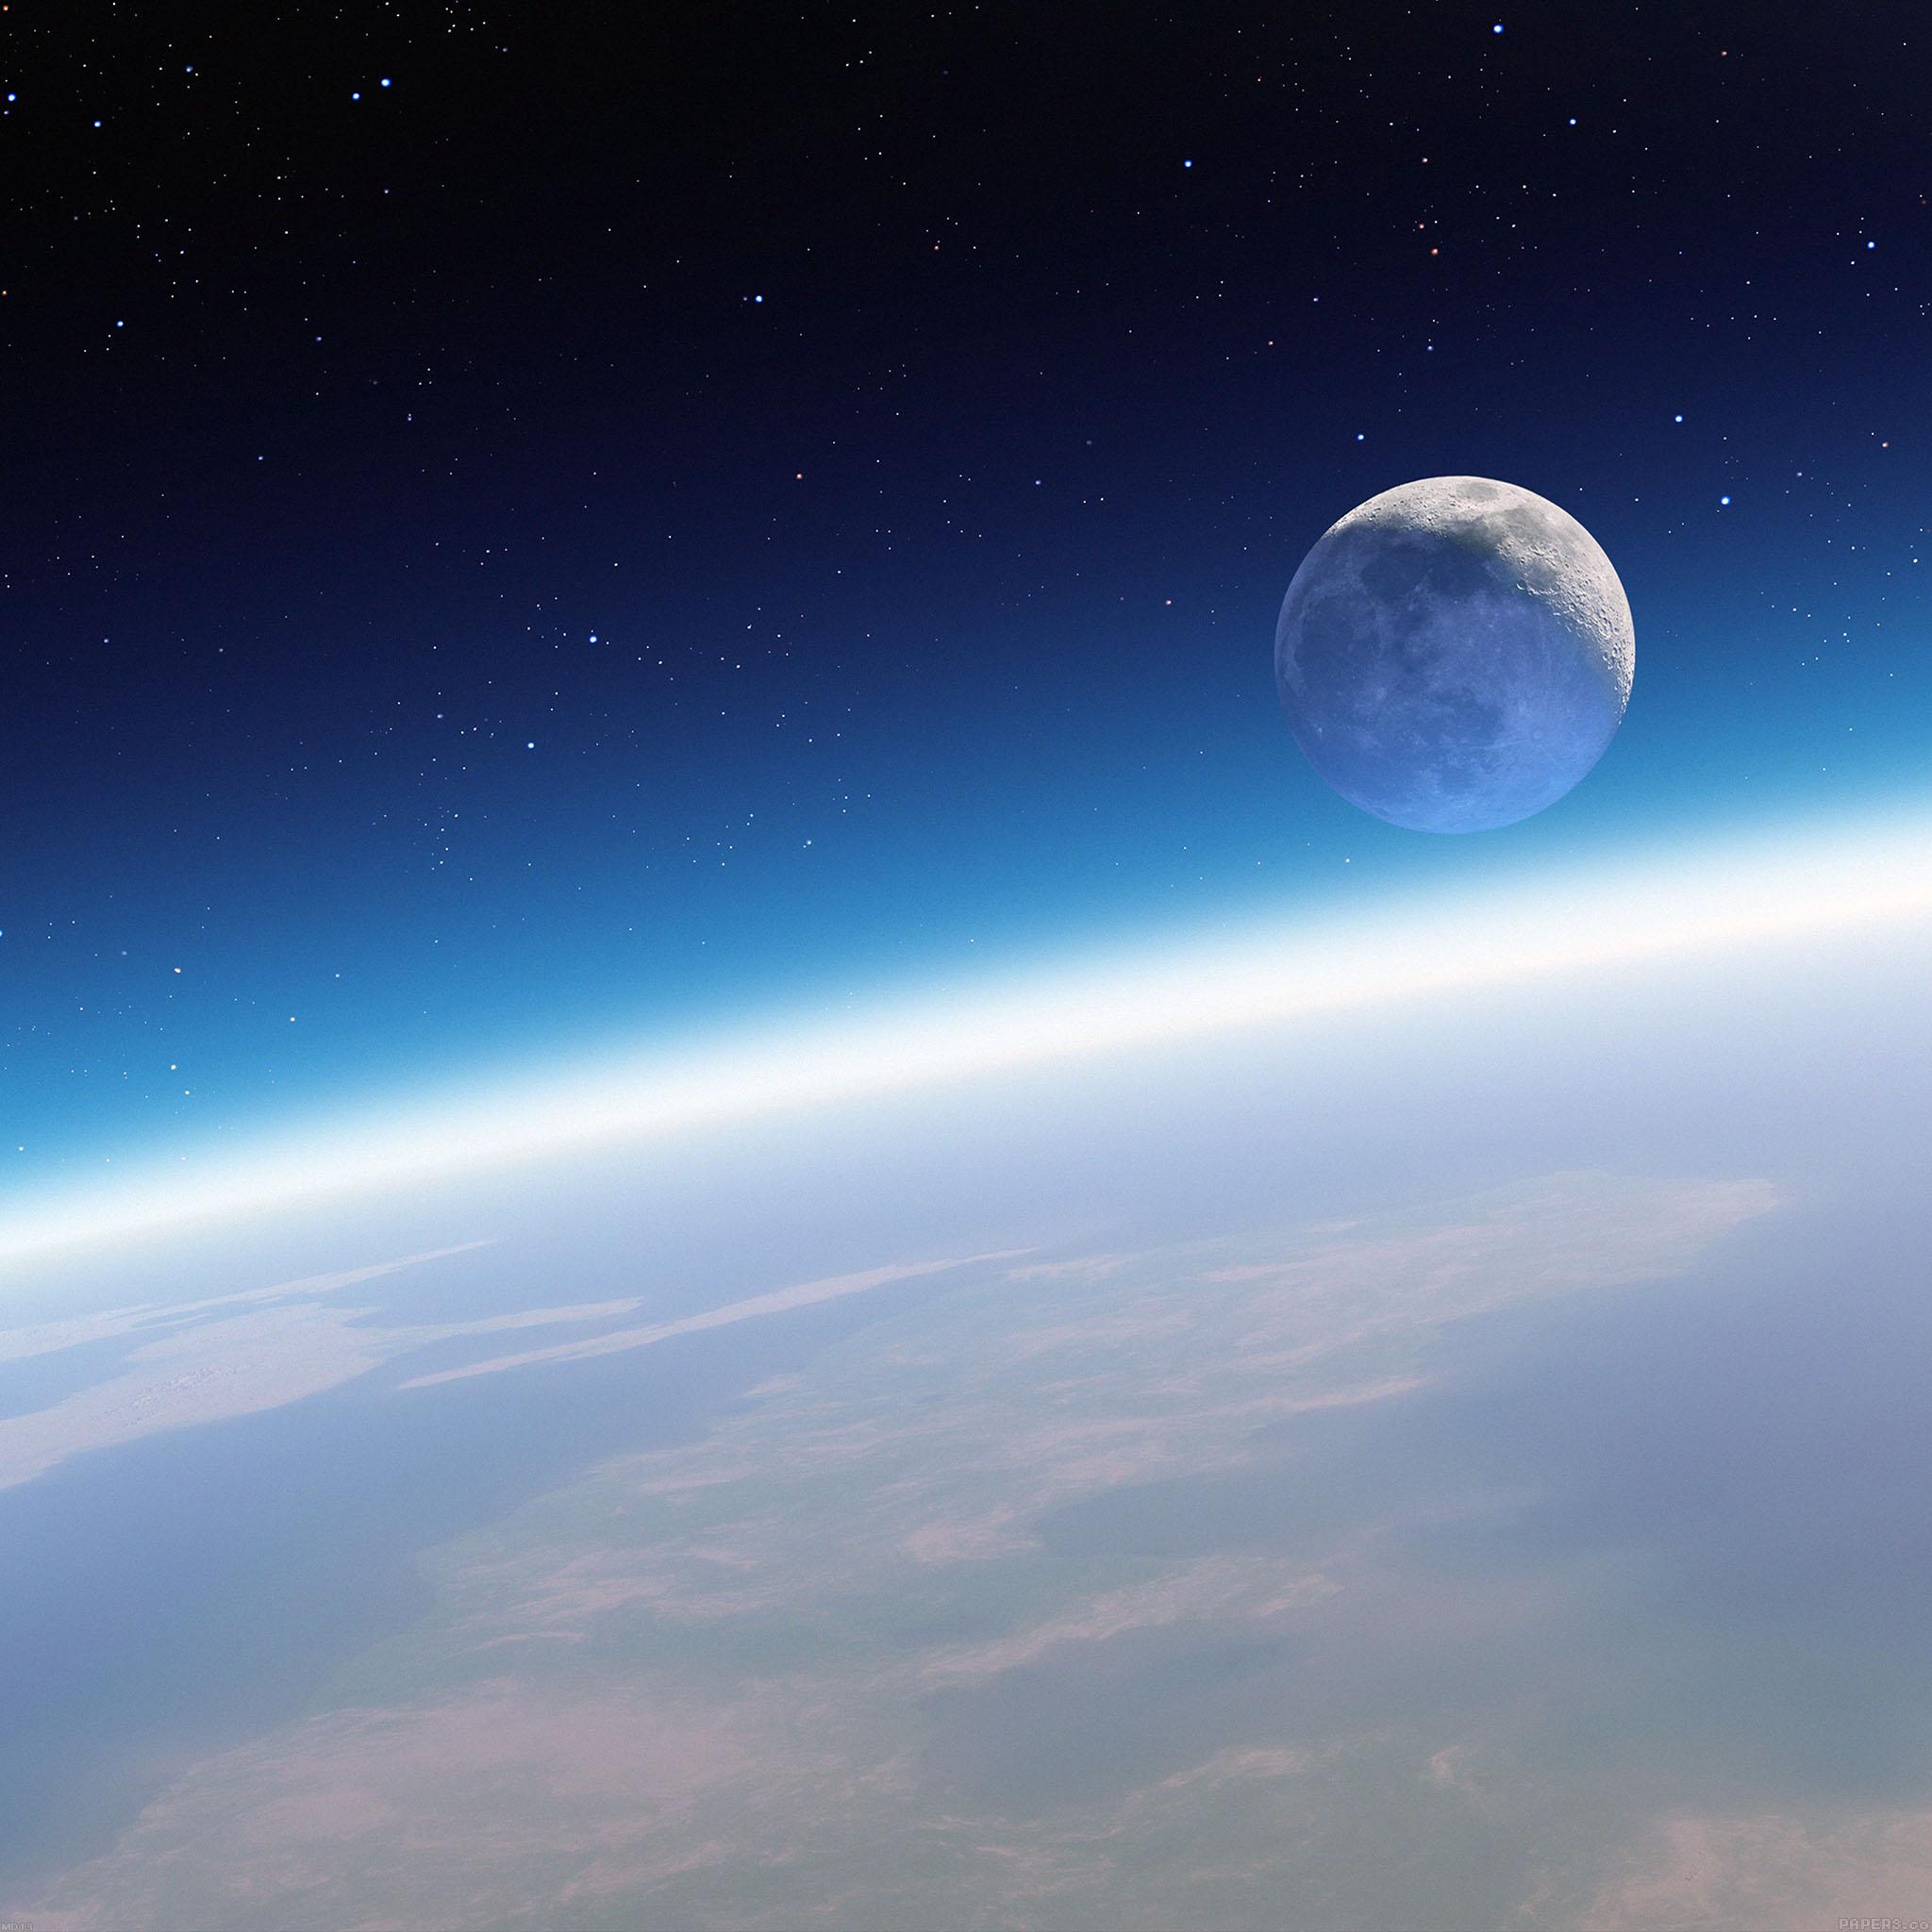 Desktop Wallpaper Earth From Space: Md13-wallpaper-earth-horizon-in-space